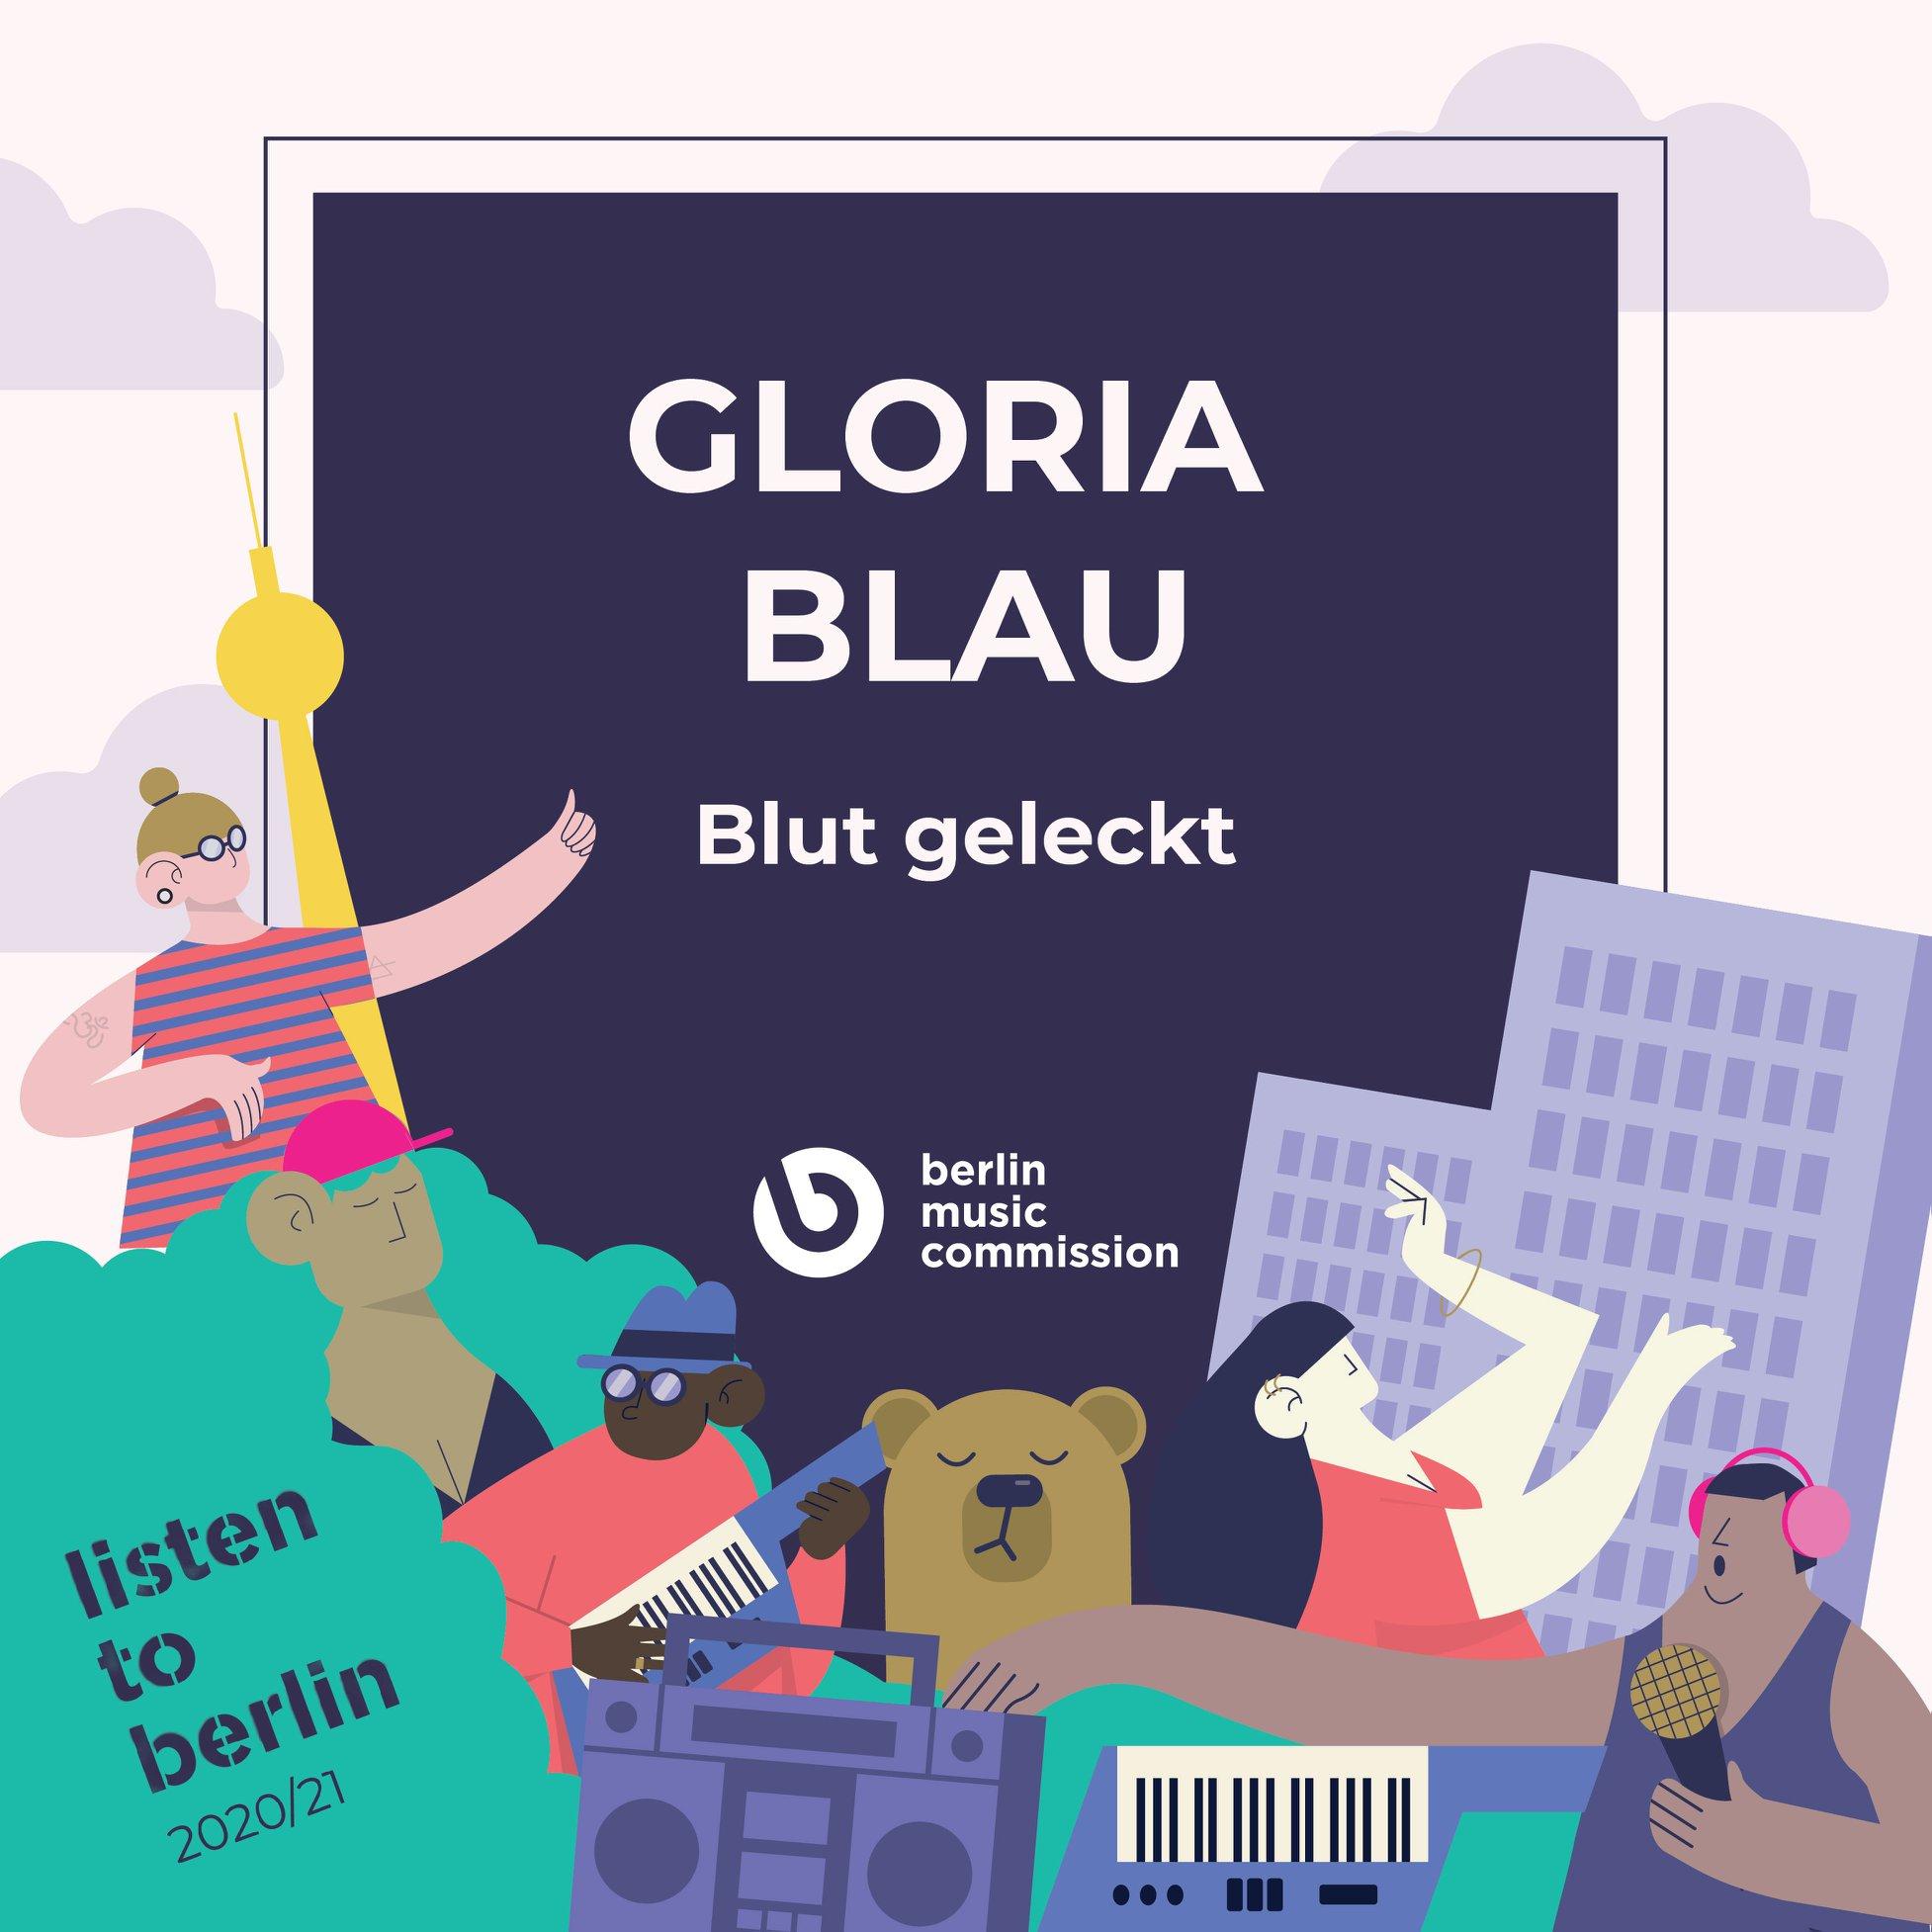 Gloria Blau Blut geleckt